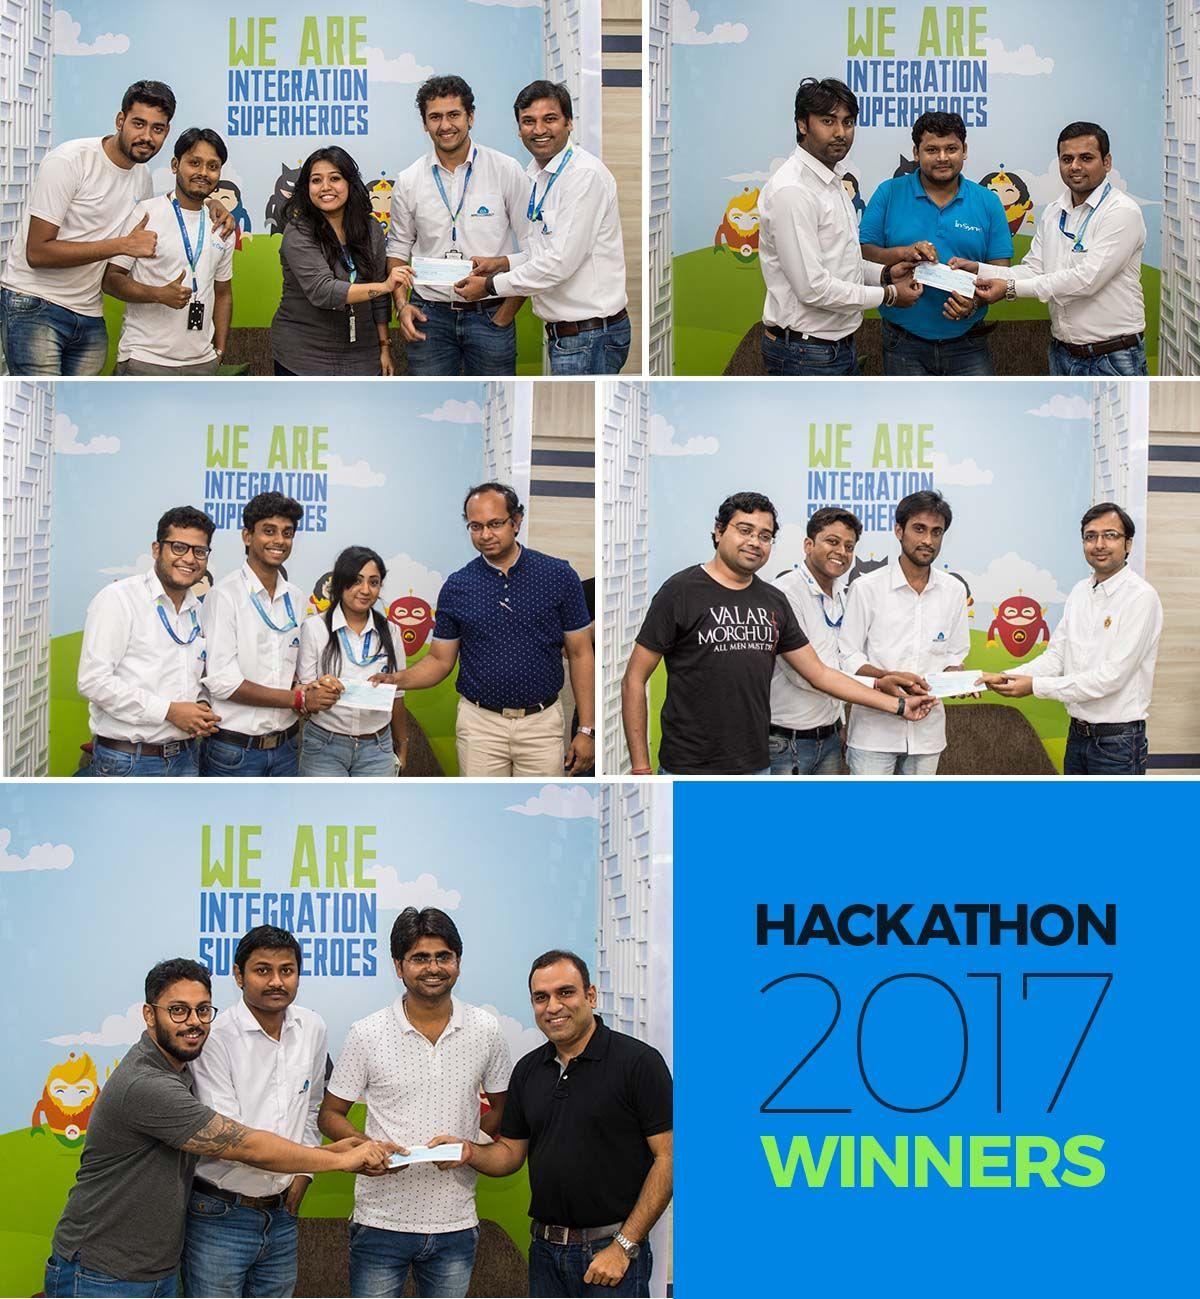 hackathon-2017-winners